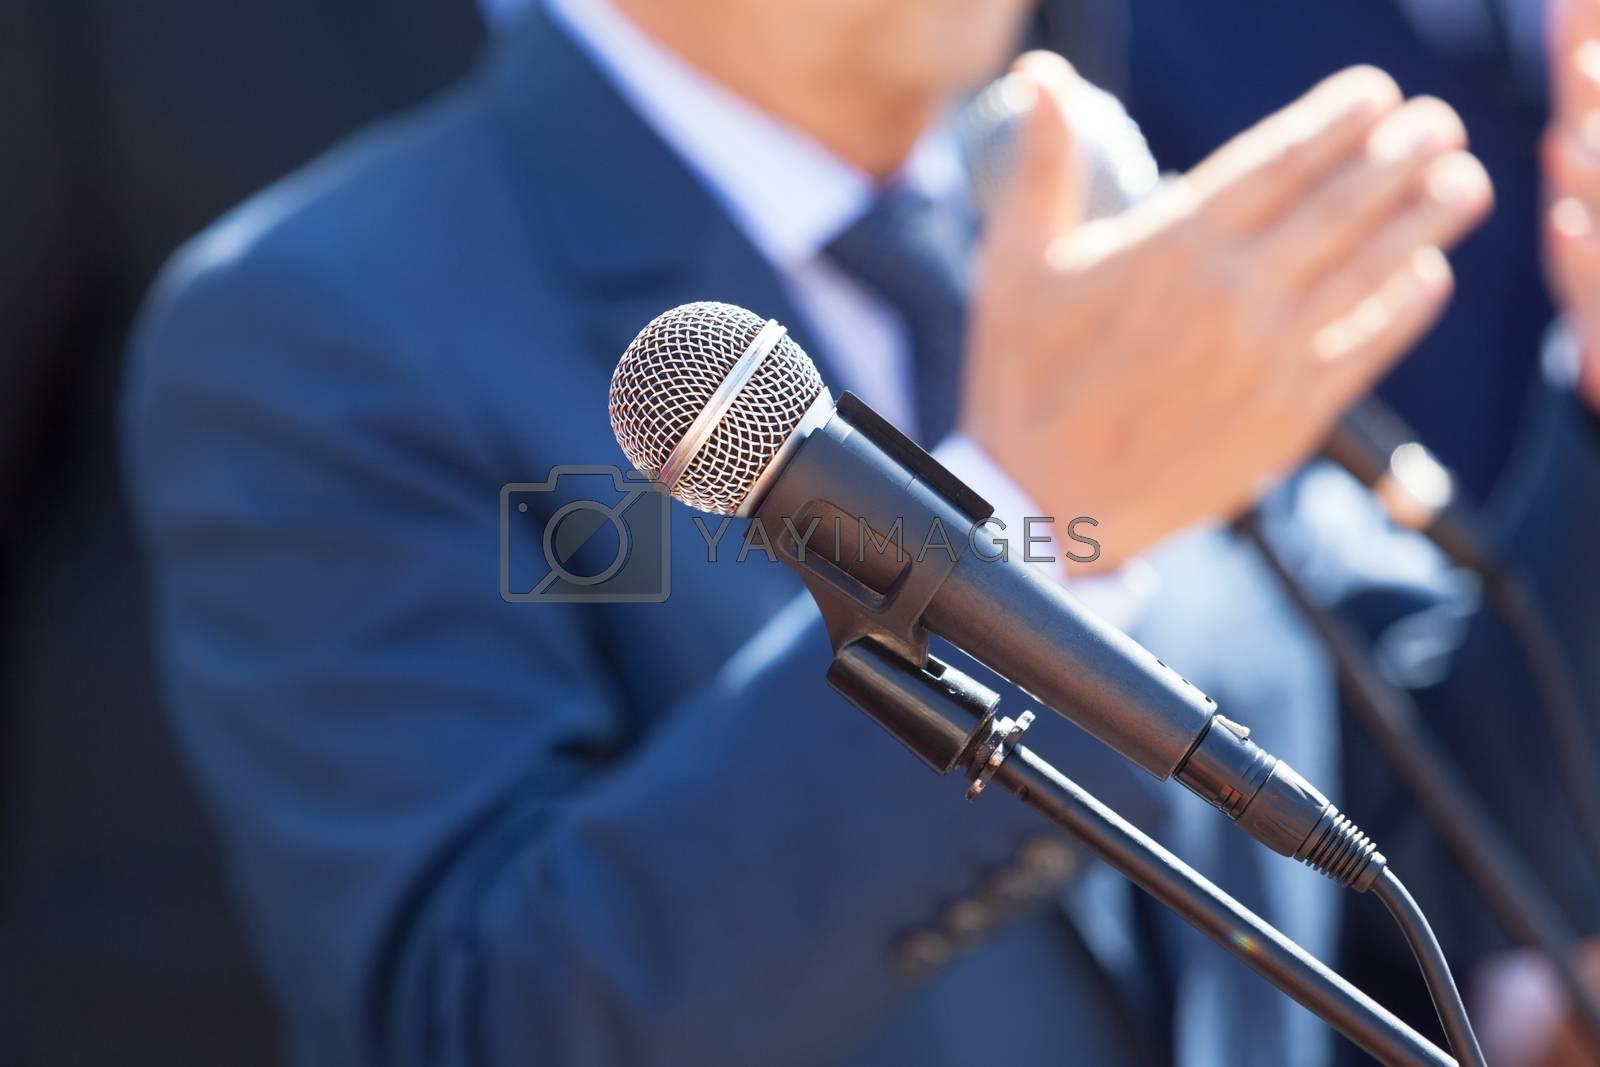 Microphone in focus against blurred speaker